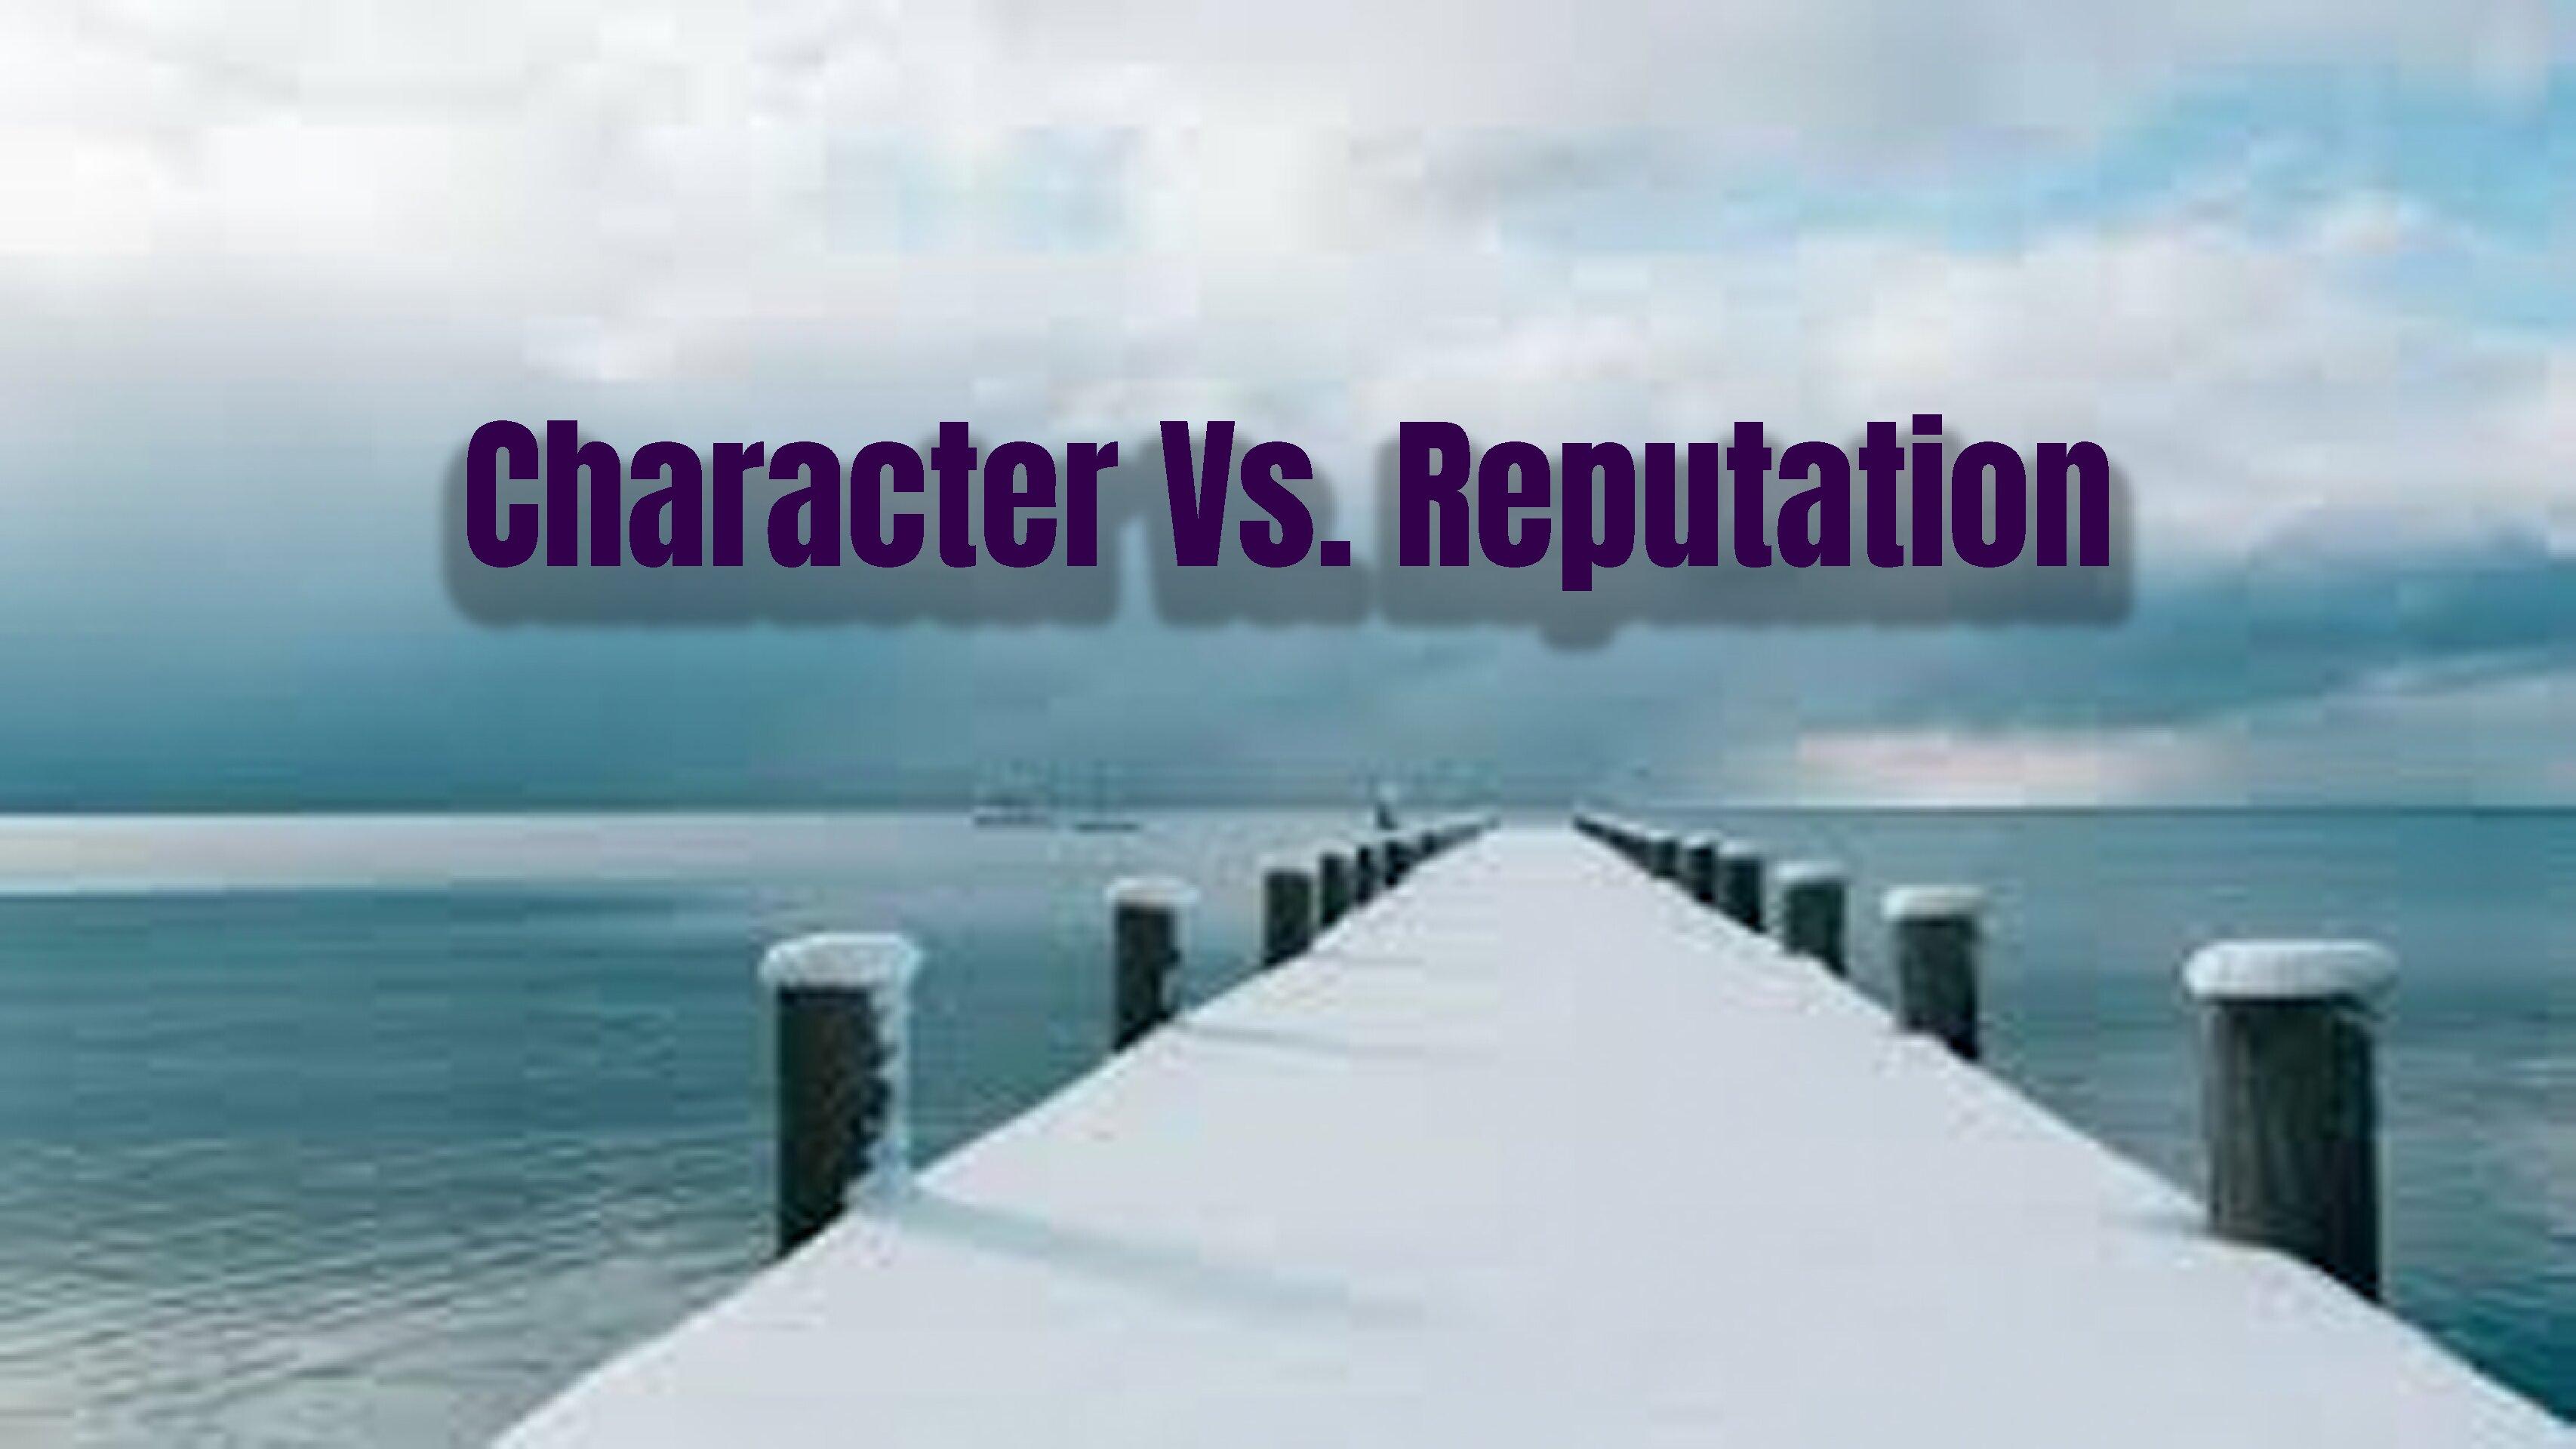 Character vs. Reputation